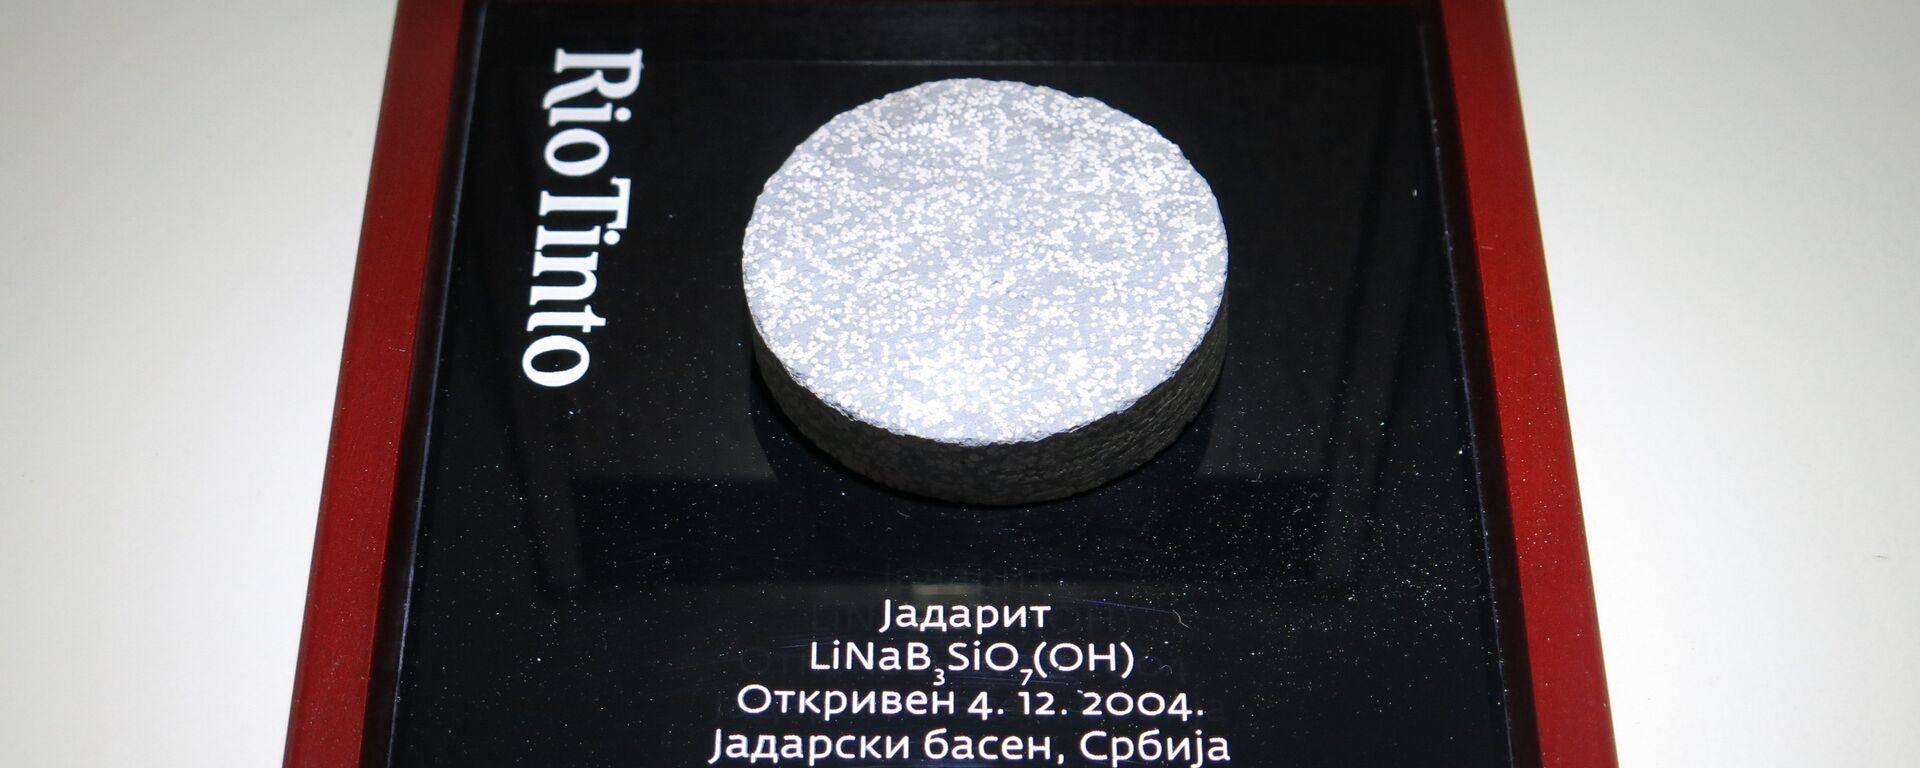 Јадарит - Sputnik Србија, 1920, 28.07.2021